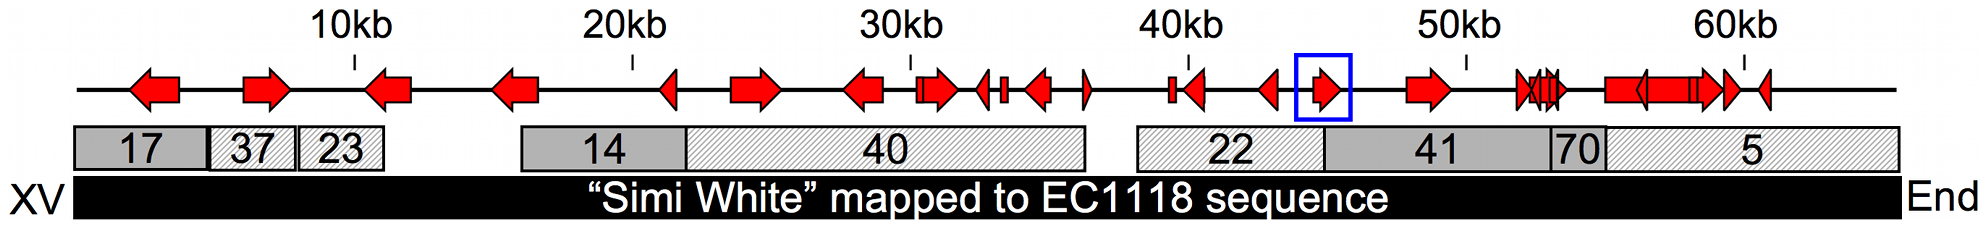 65kb insertion in subtelomeric region of chromosome XV.